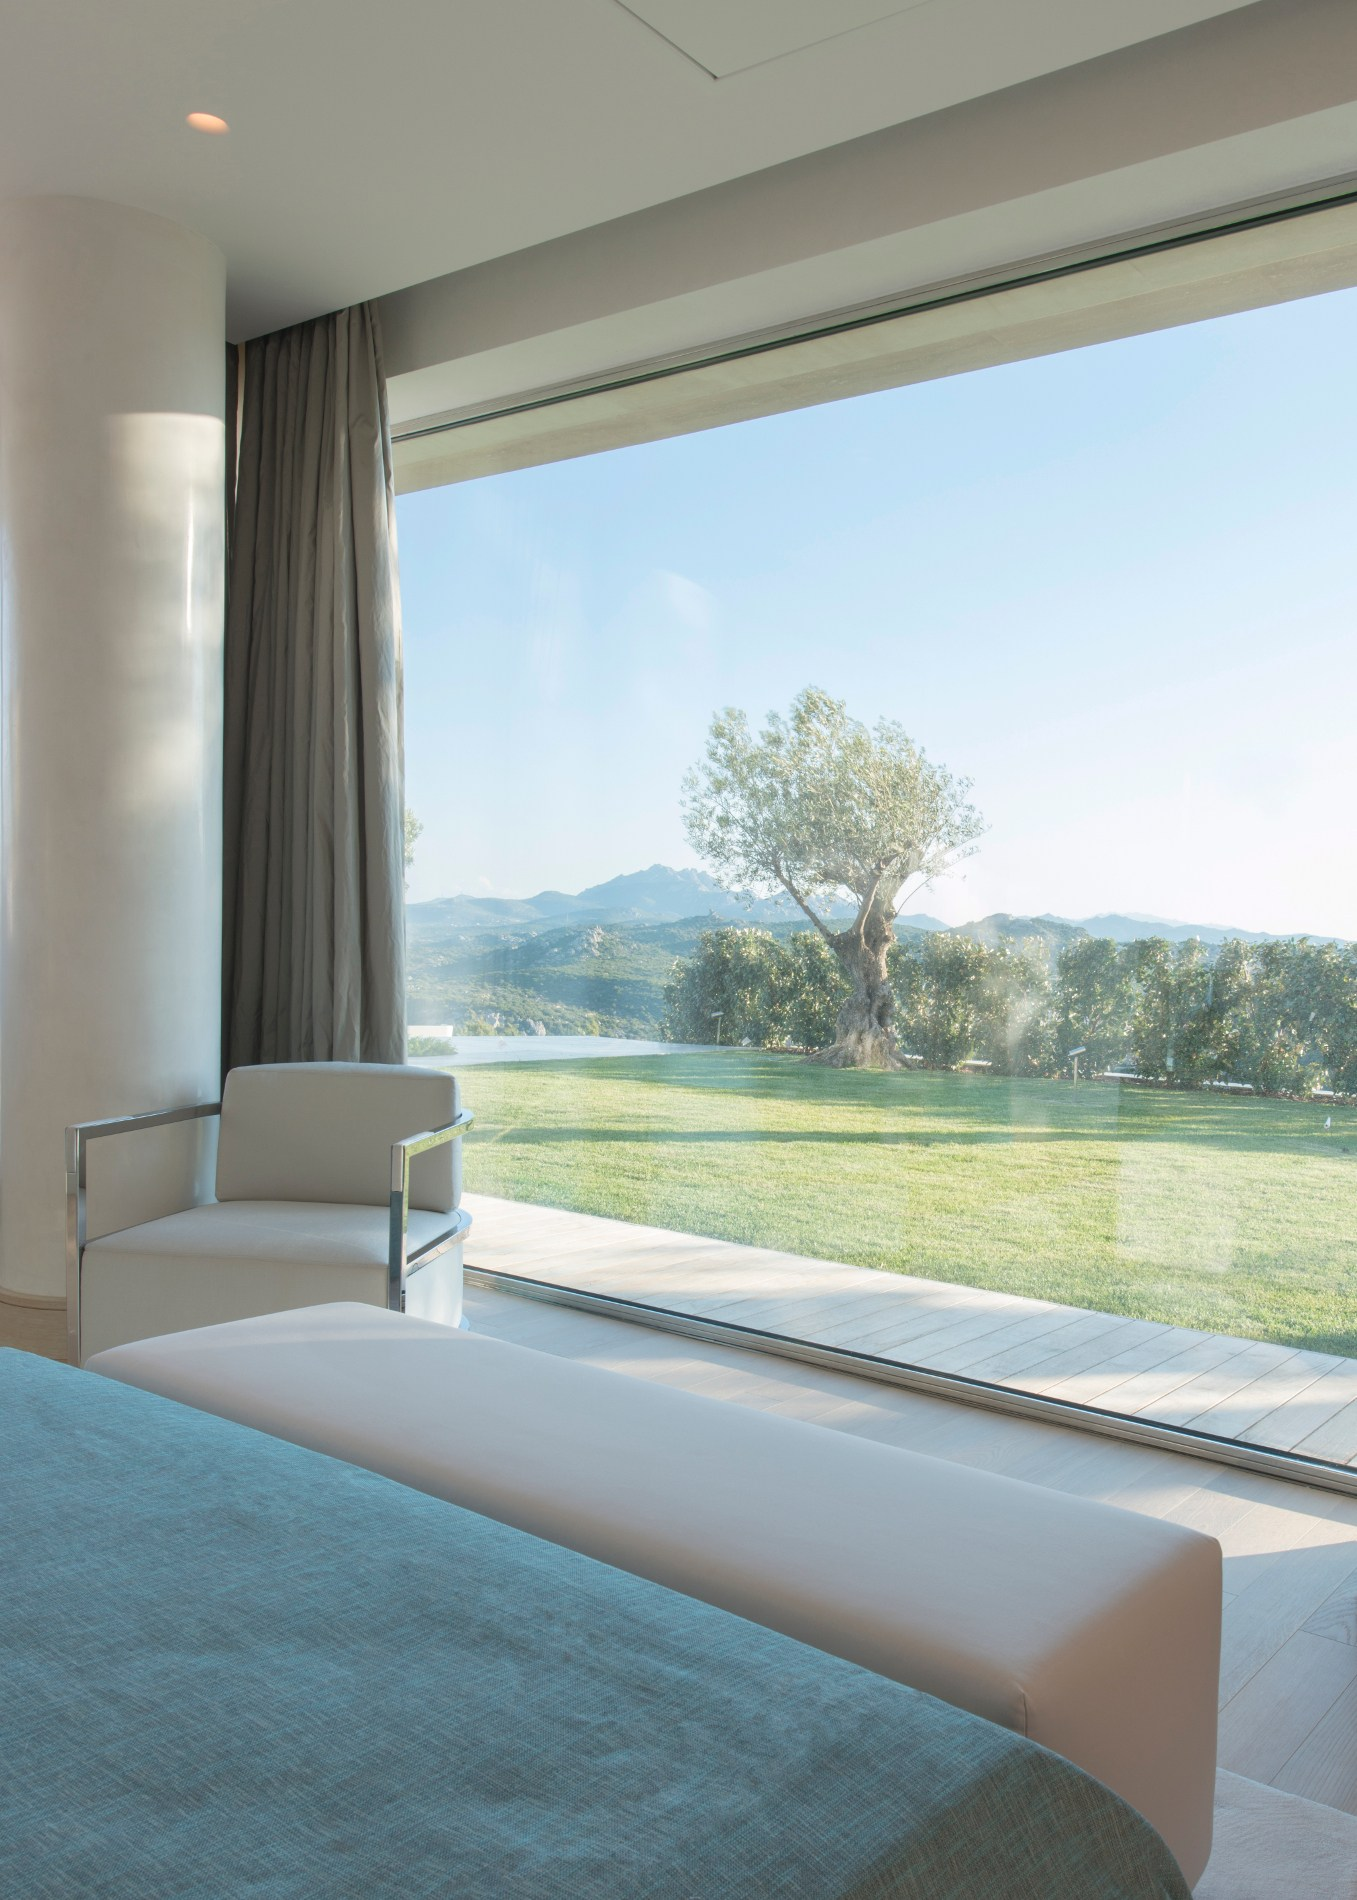 Mogs 65 taglio termico inox porta finestra by mogs srl unipersonale - Finestre a taglio termico ...